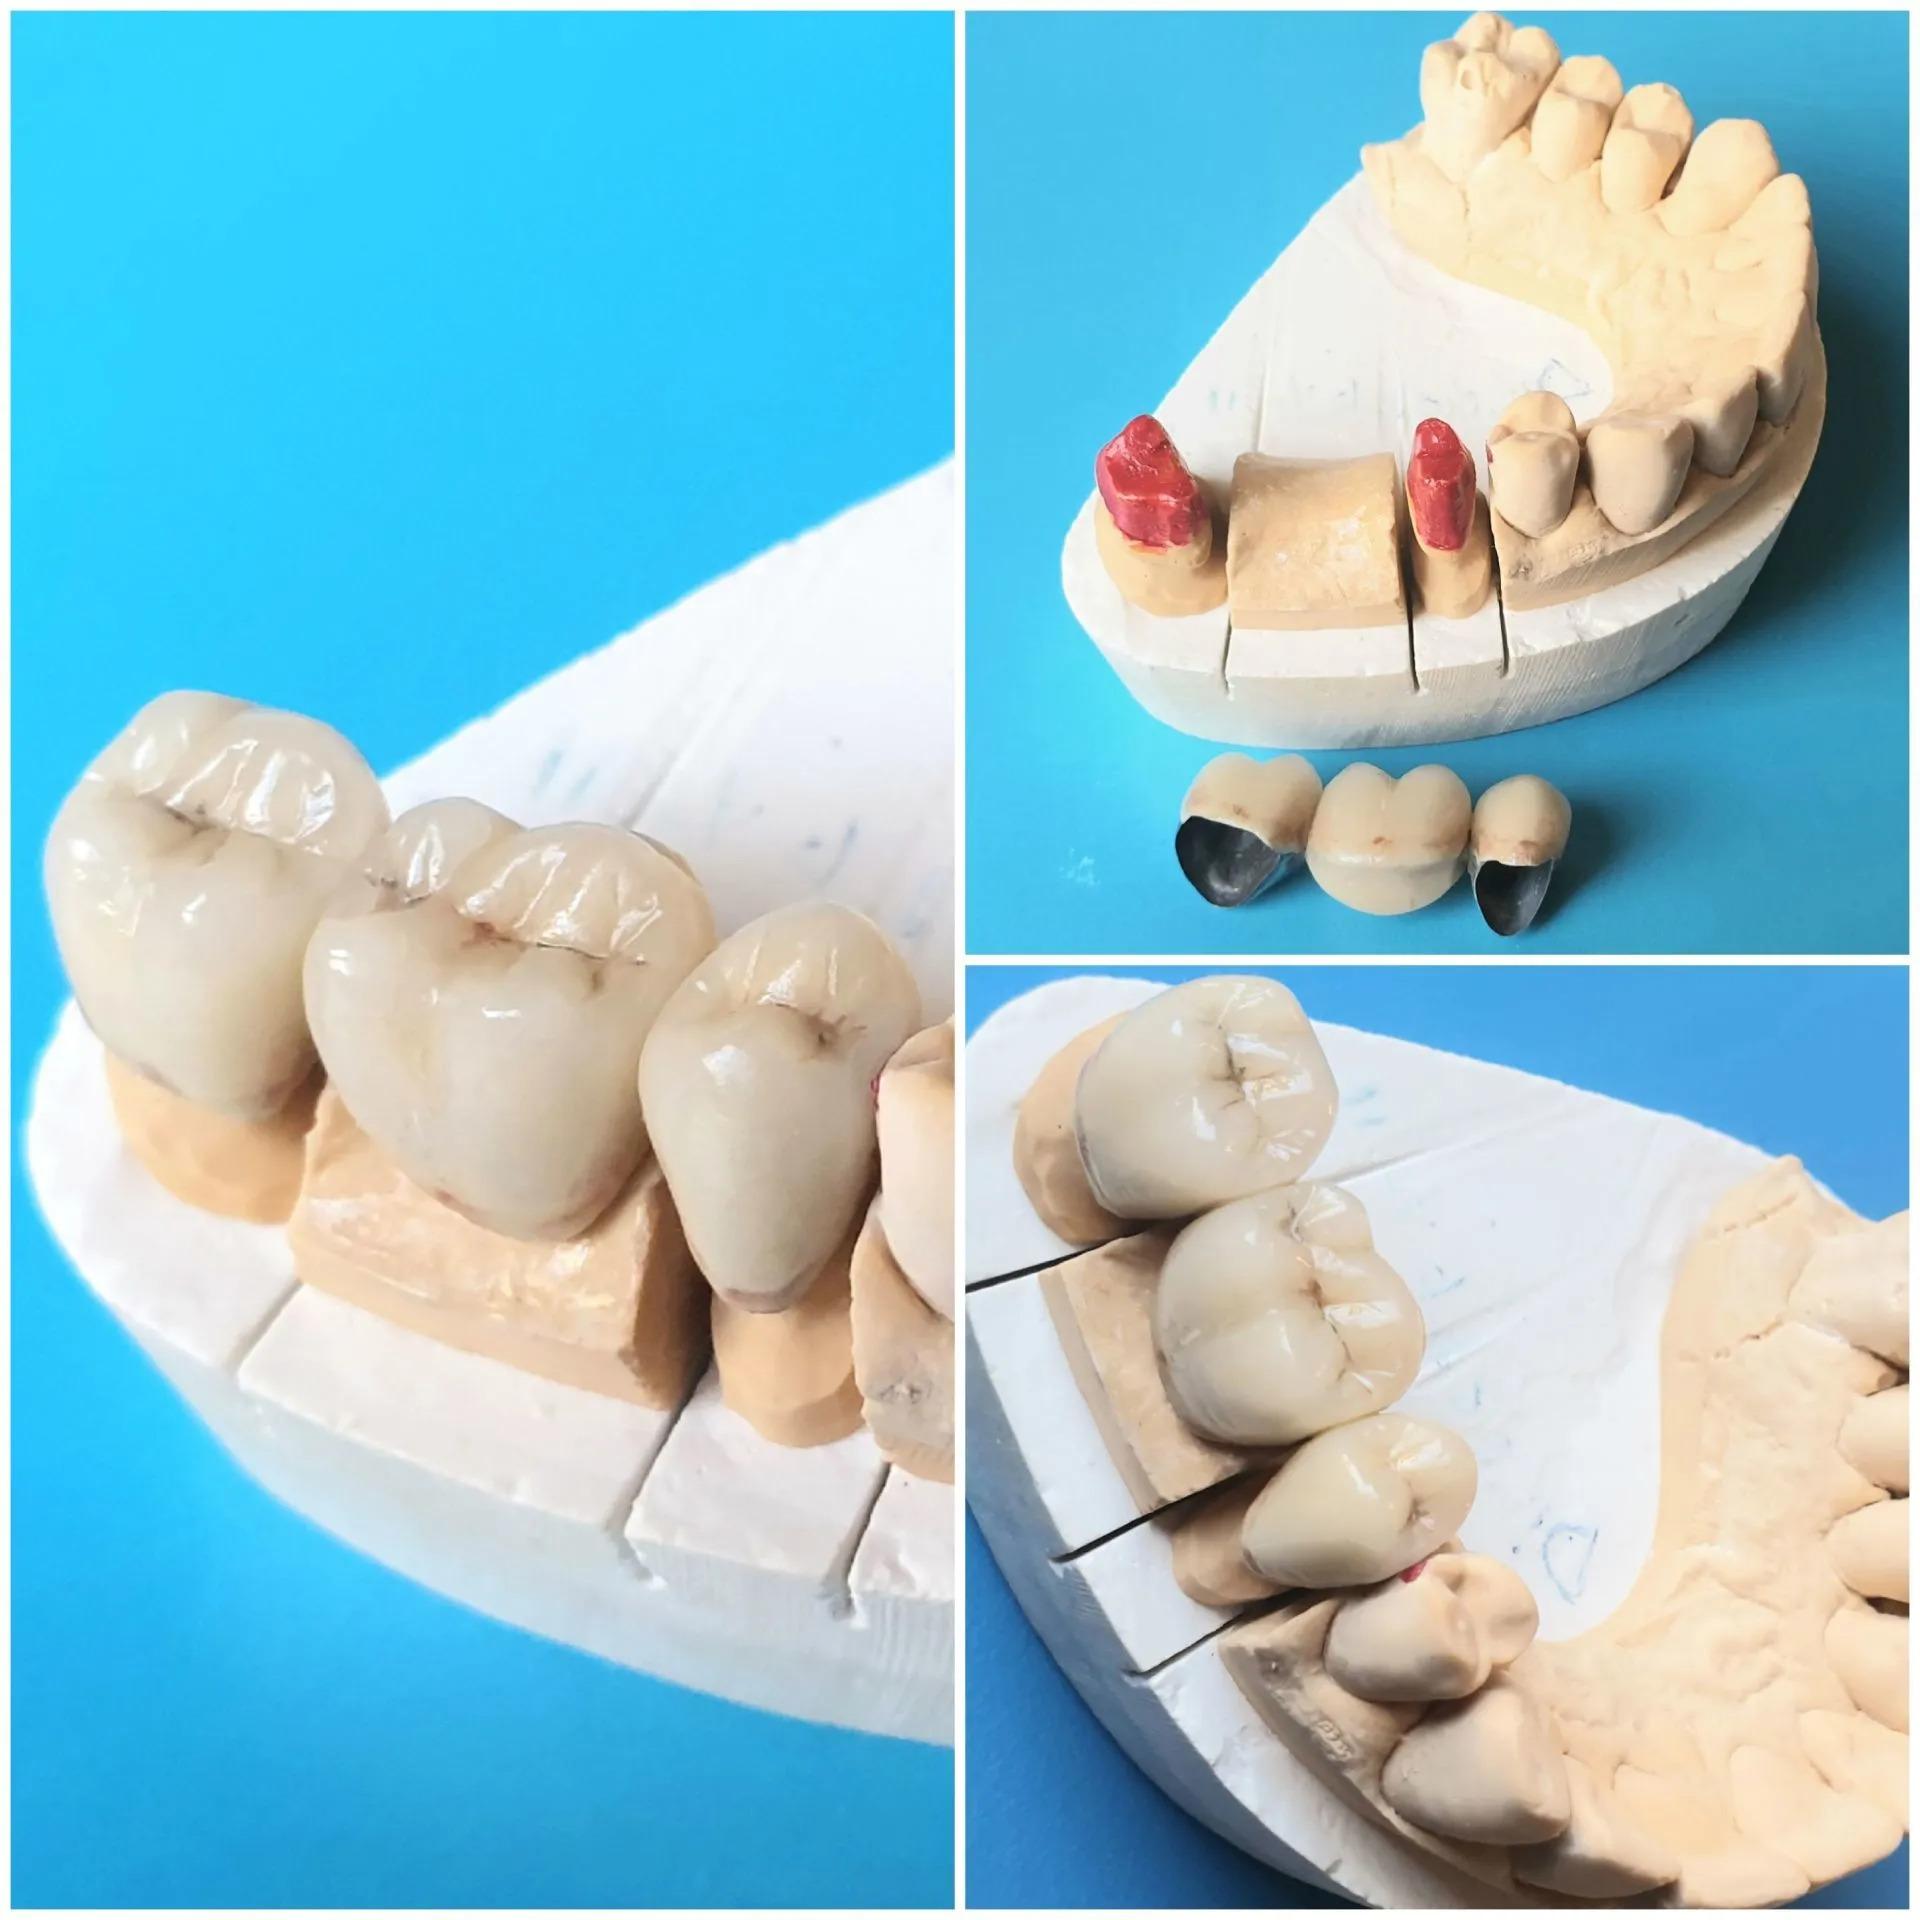 riparazione protesi dentarie roma prati